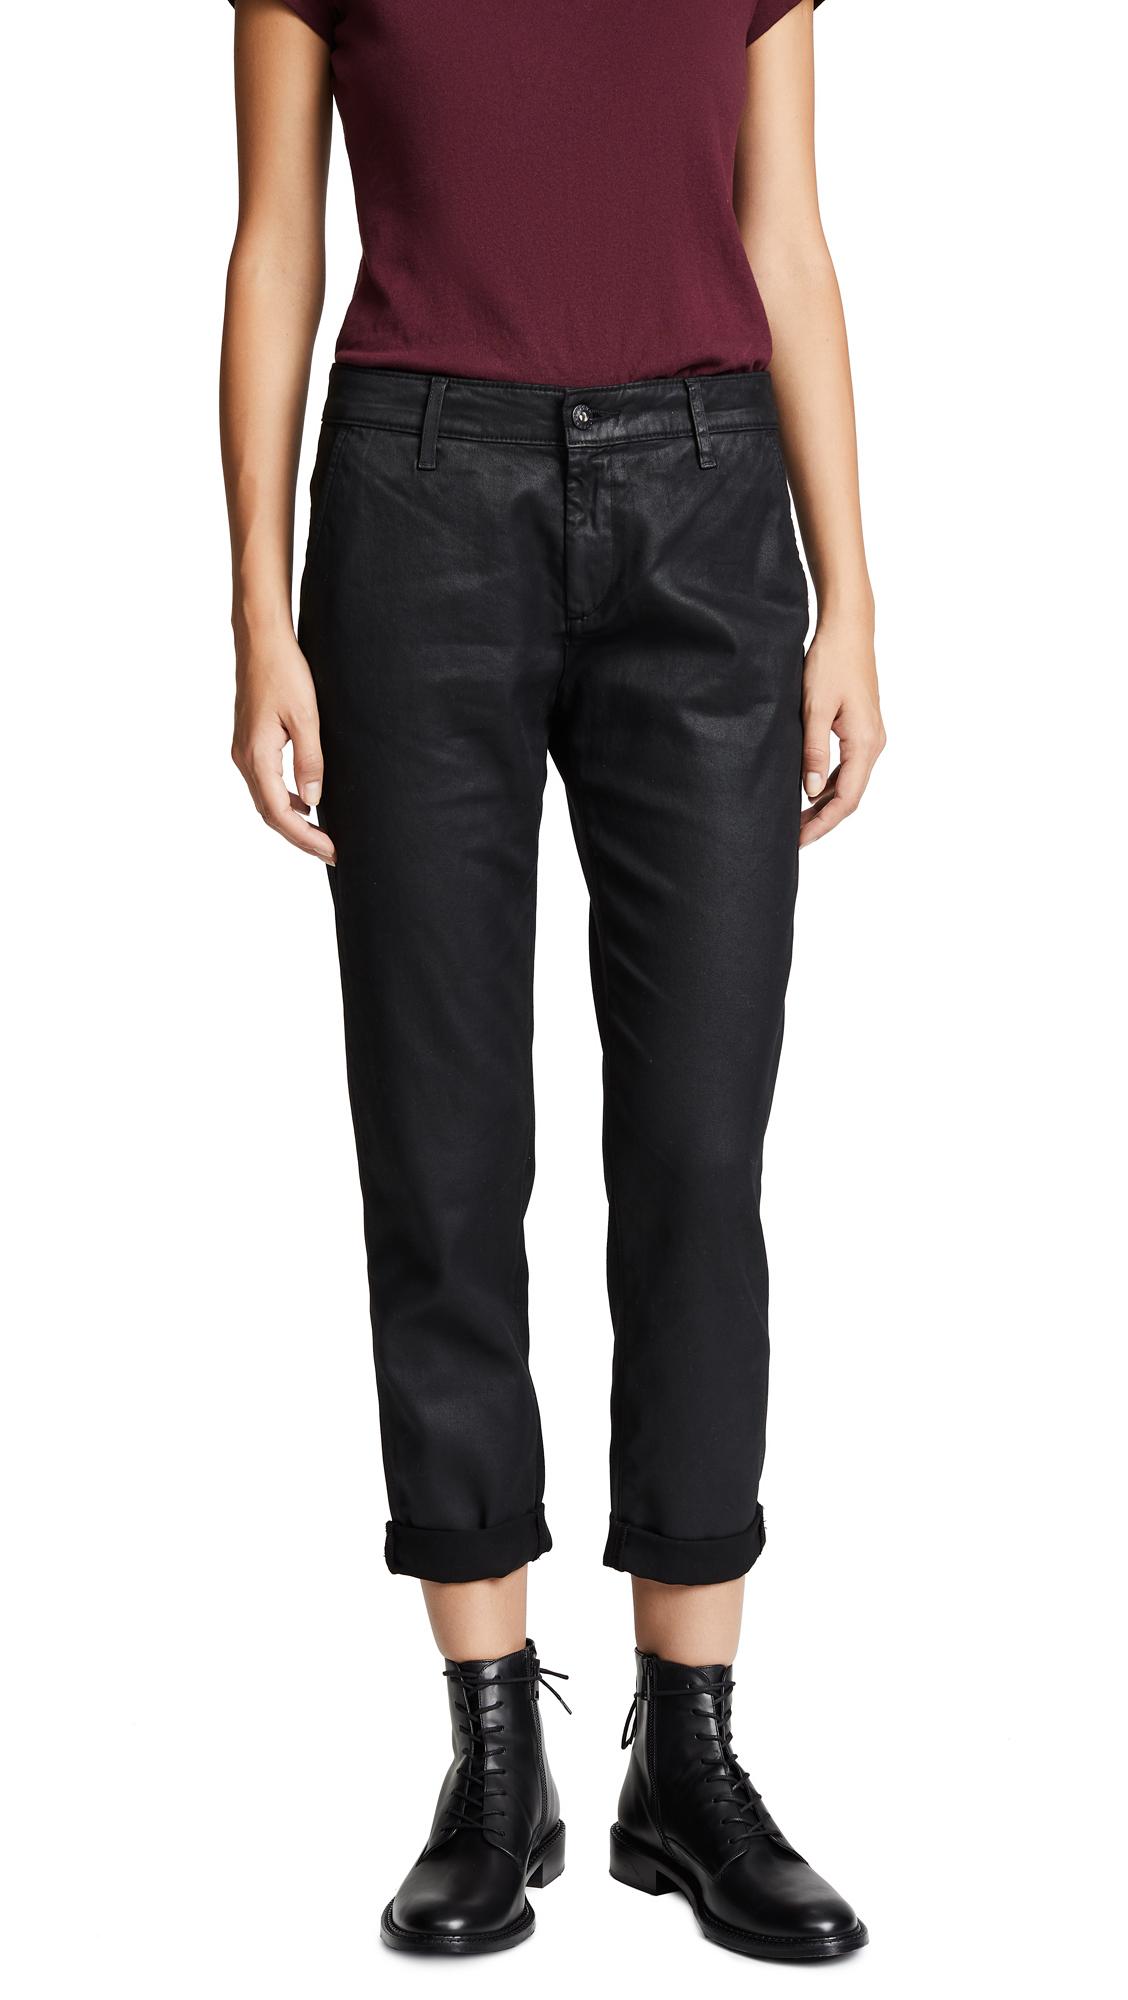 AG The Vintage Leatherette Caden Trousers